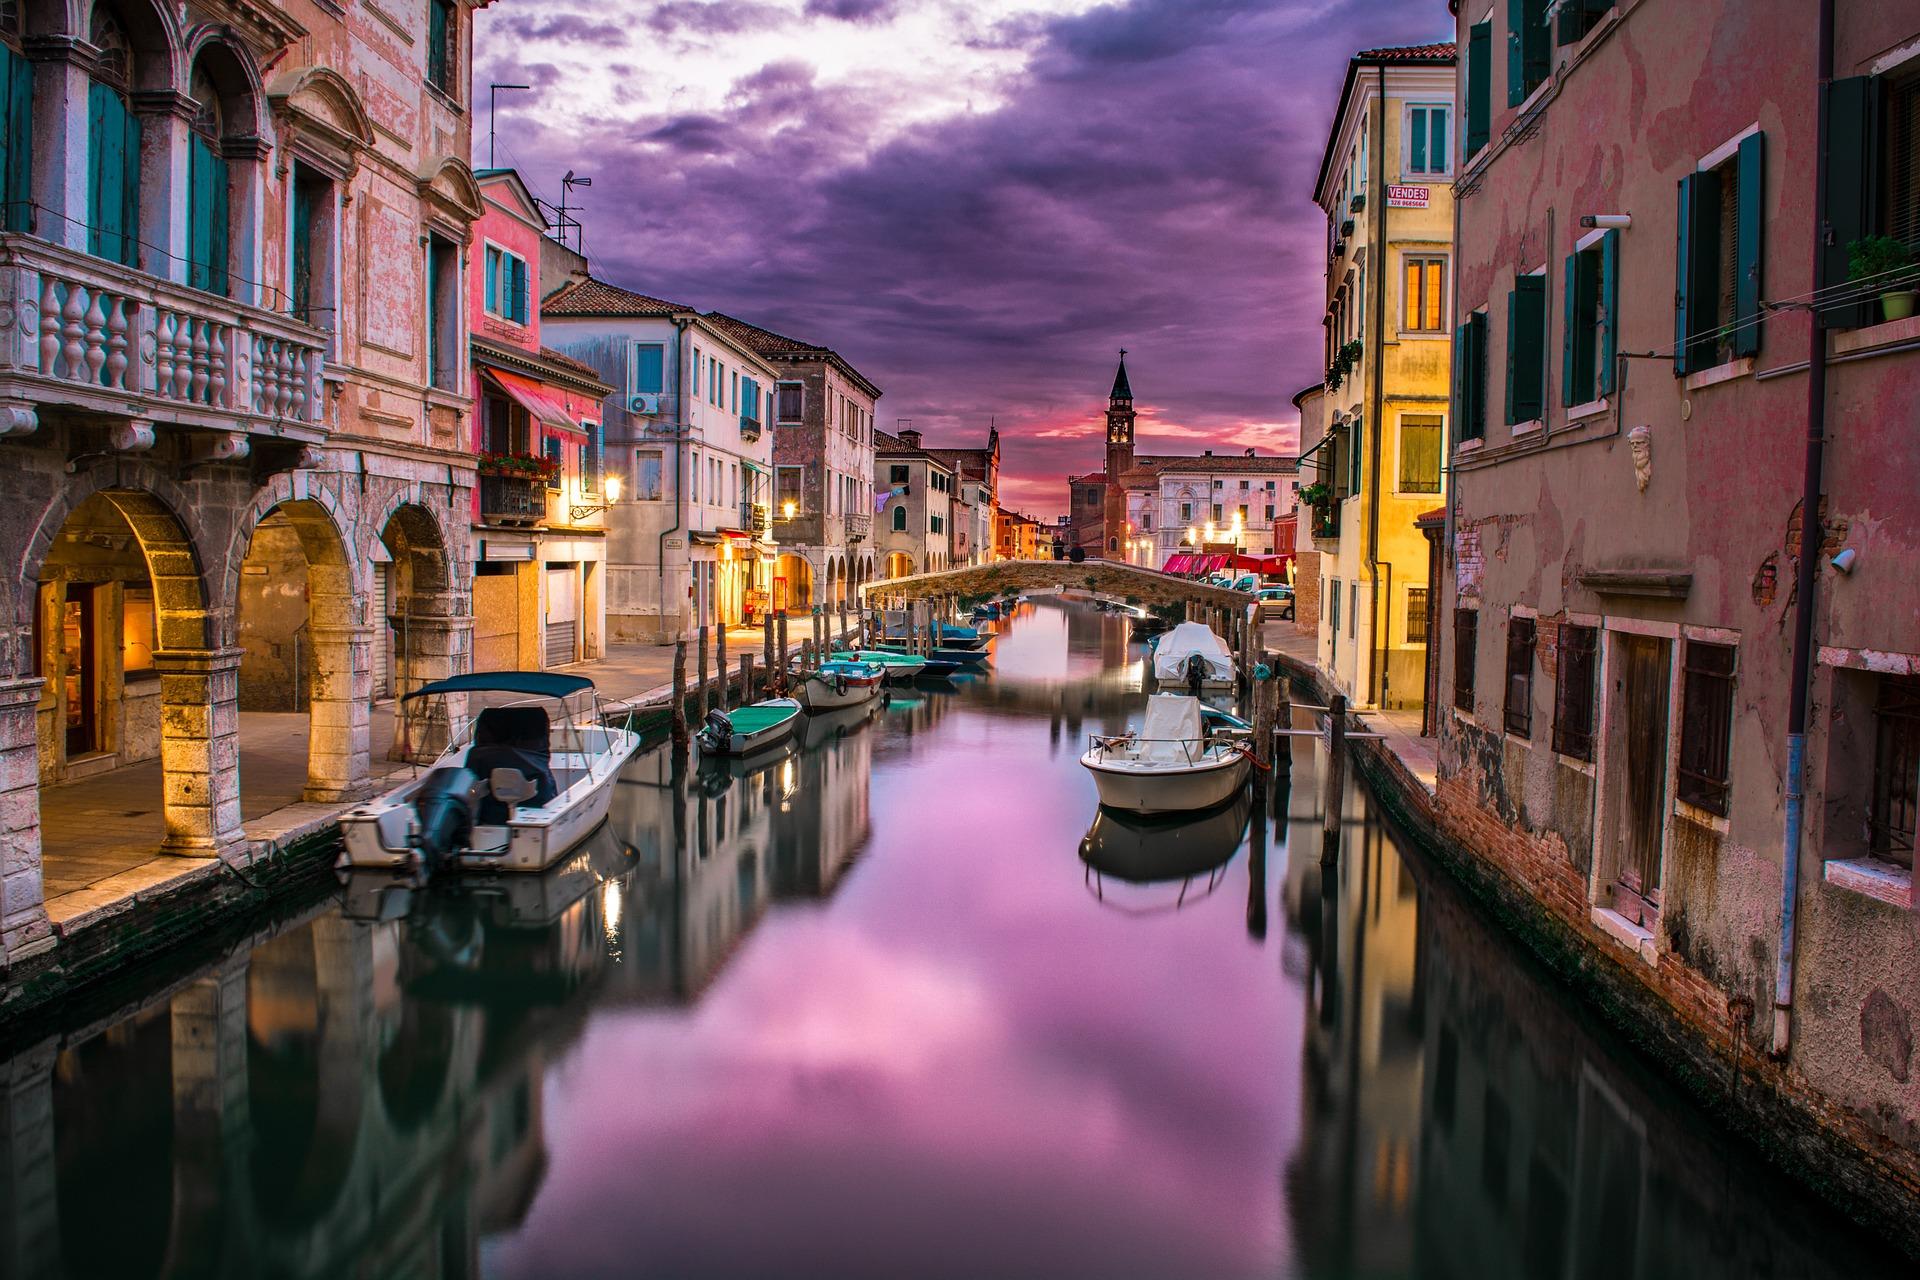 VILLA NOBILE, Leisure Activities in Venice